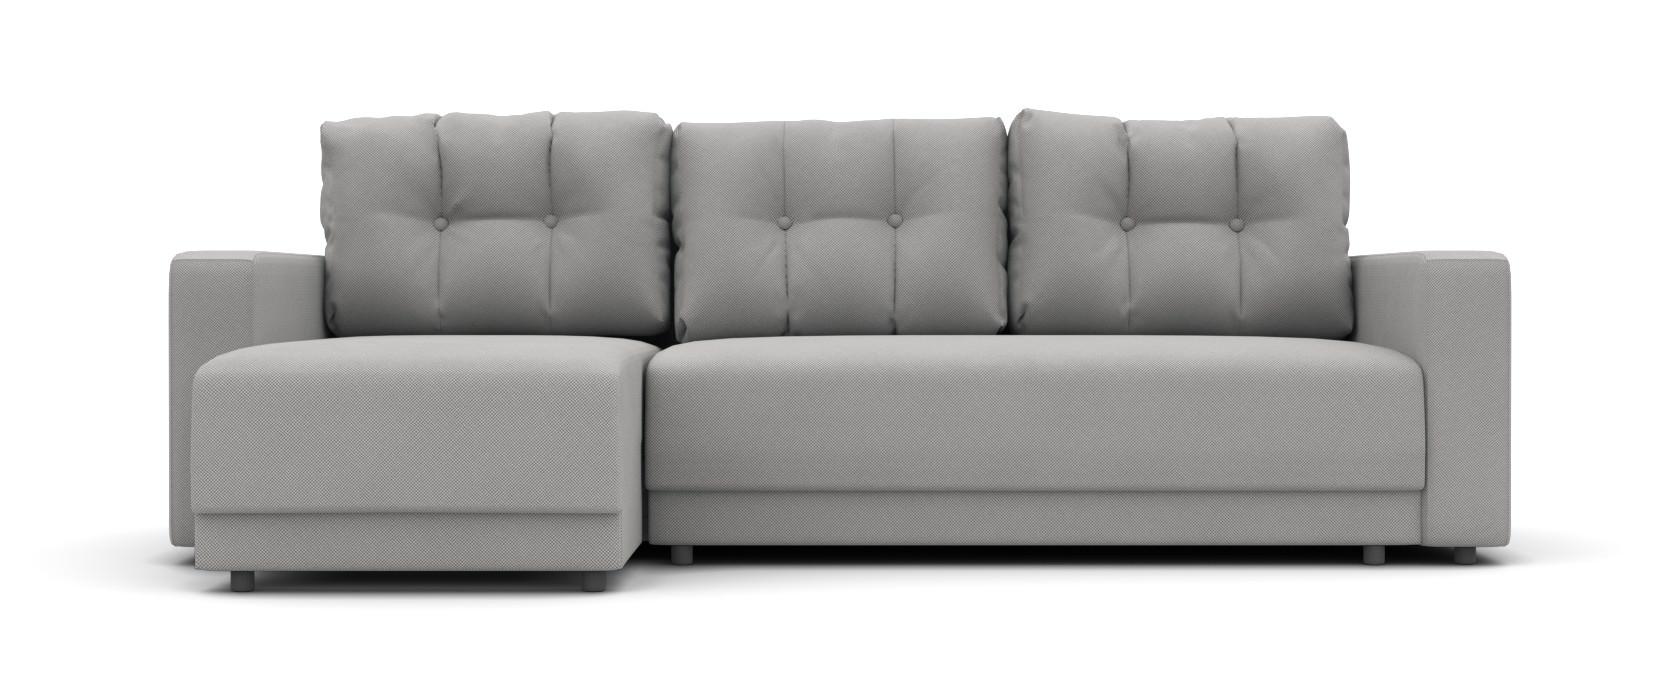 Угловой диван Famiglia - Pufetto